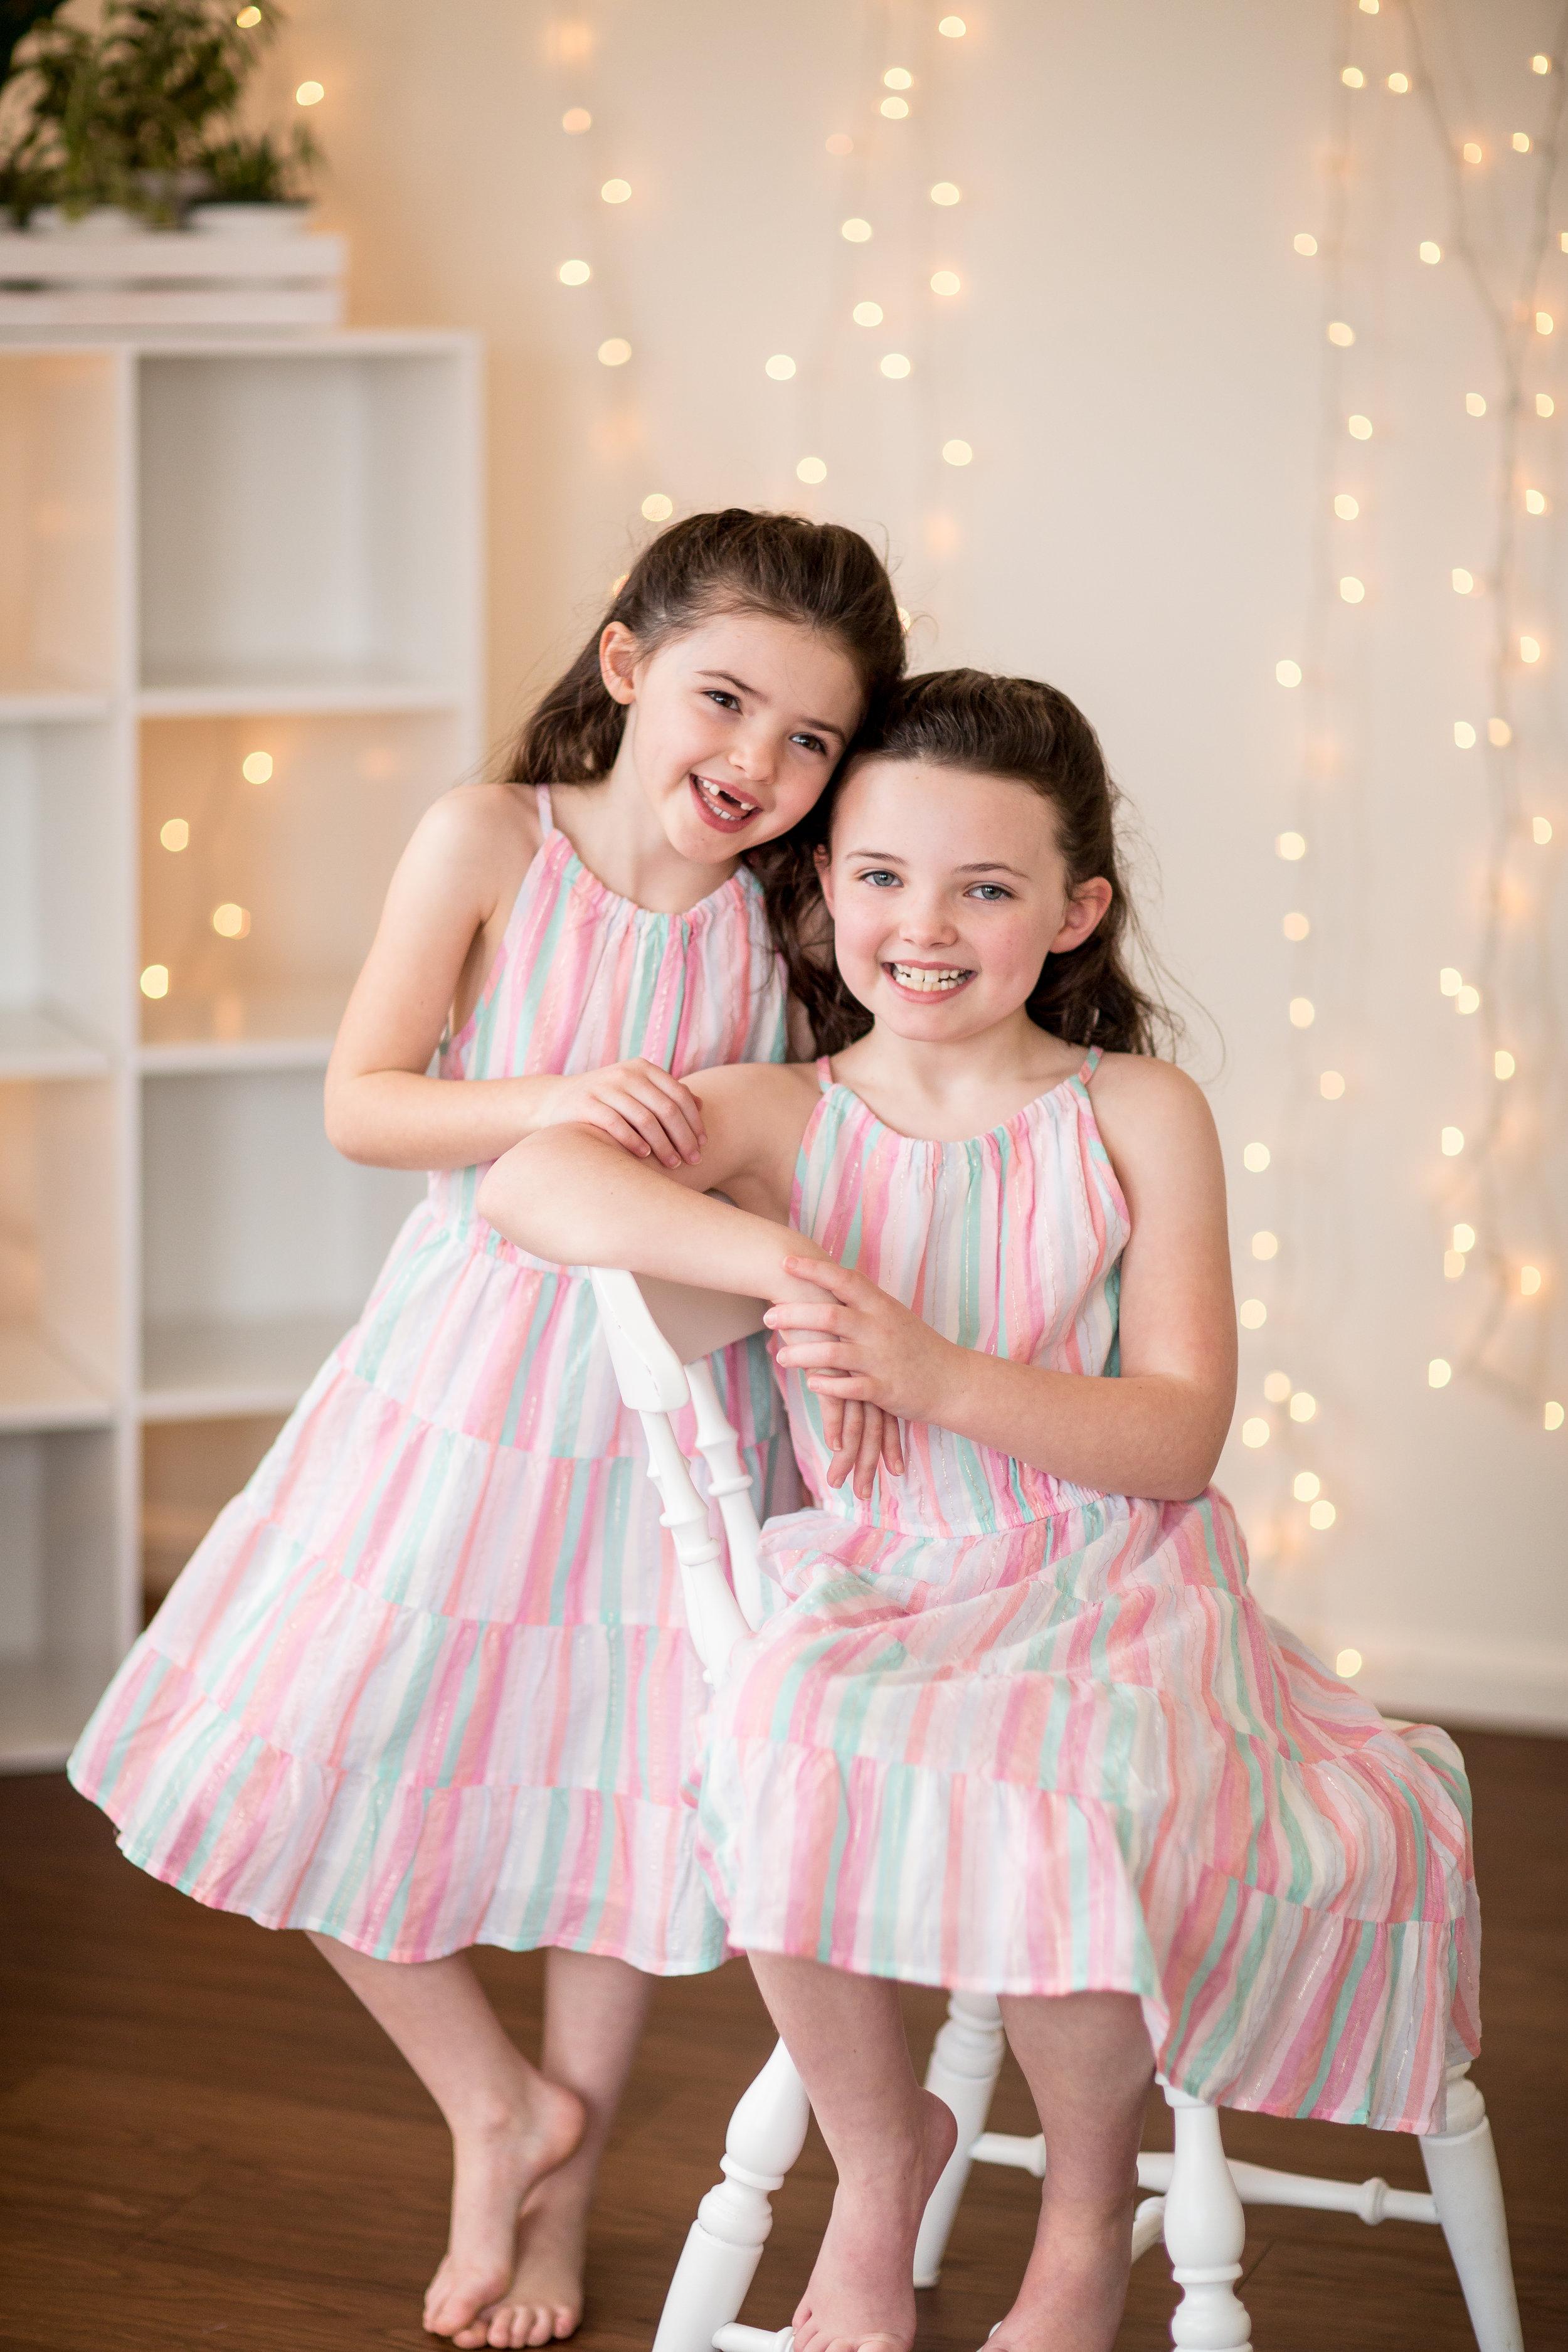 Sisters-Stripes-and-strings-of-lights-1.jpg